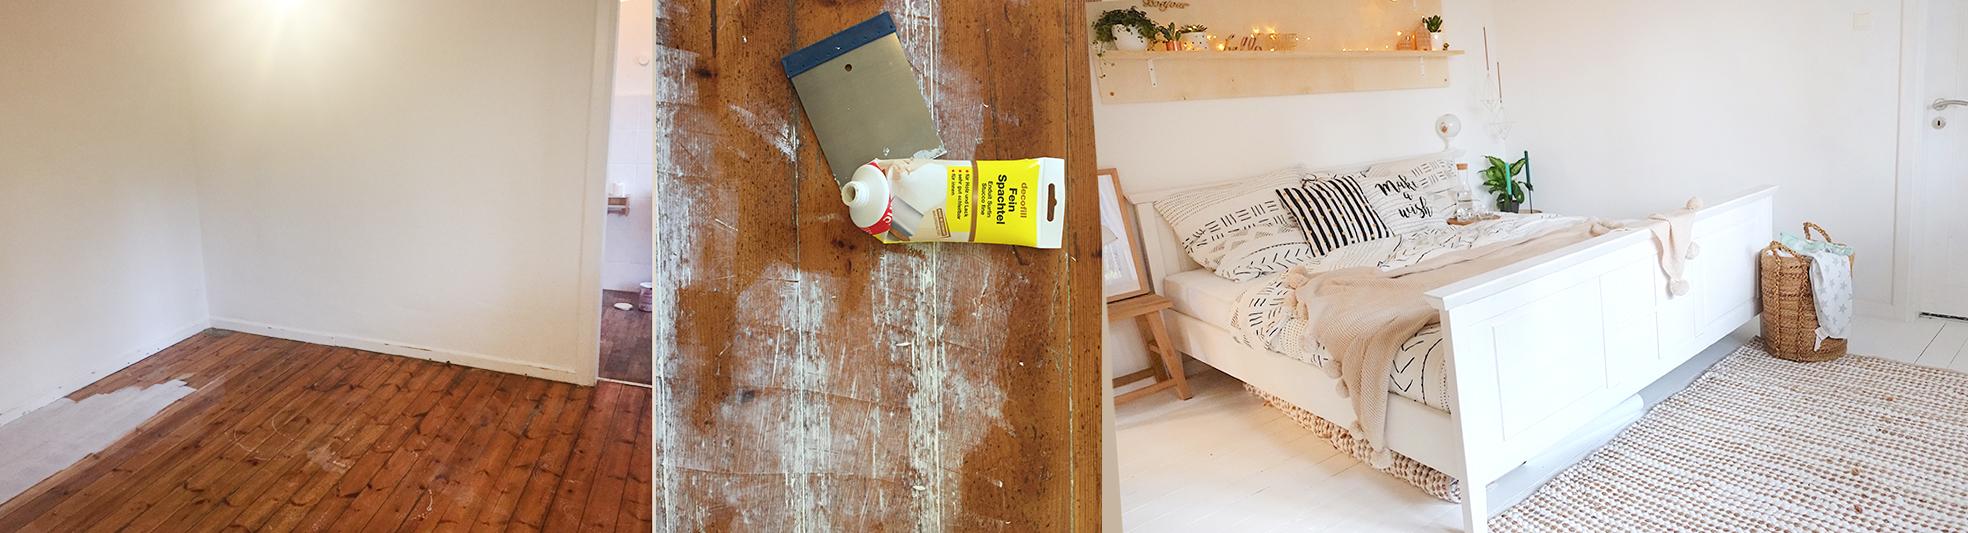 Lybstes Haus: Holzboden weiß lackieren